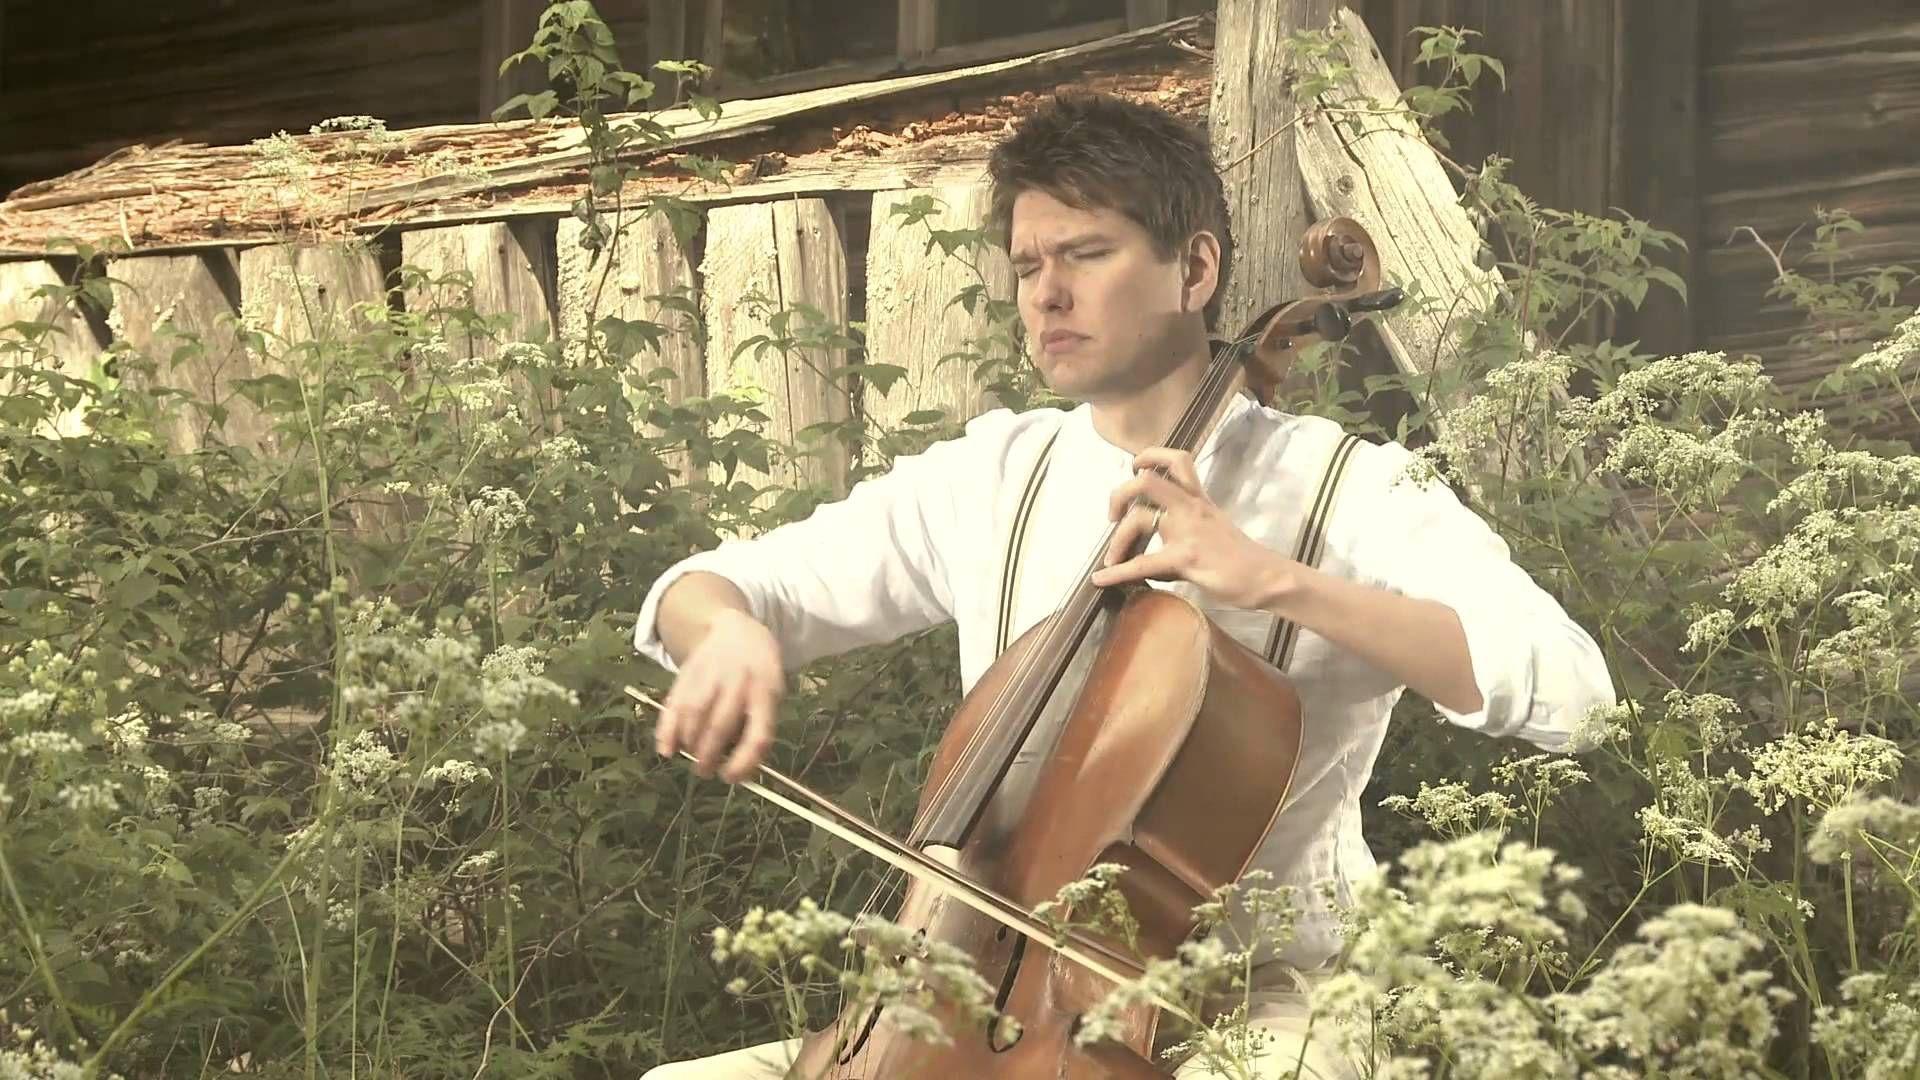 Jean Sibelius:  Impromptu op.  5/5 (Musiikkivideo / Music video)